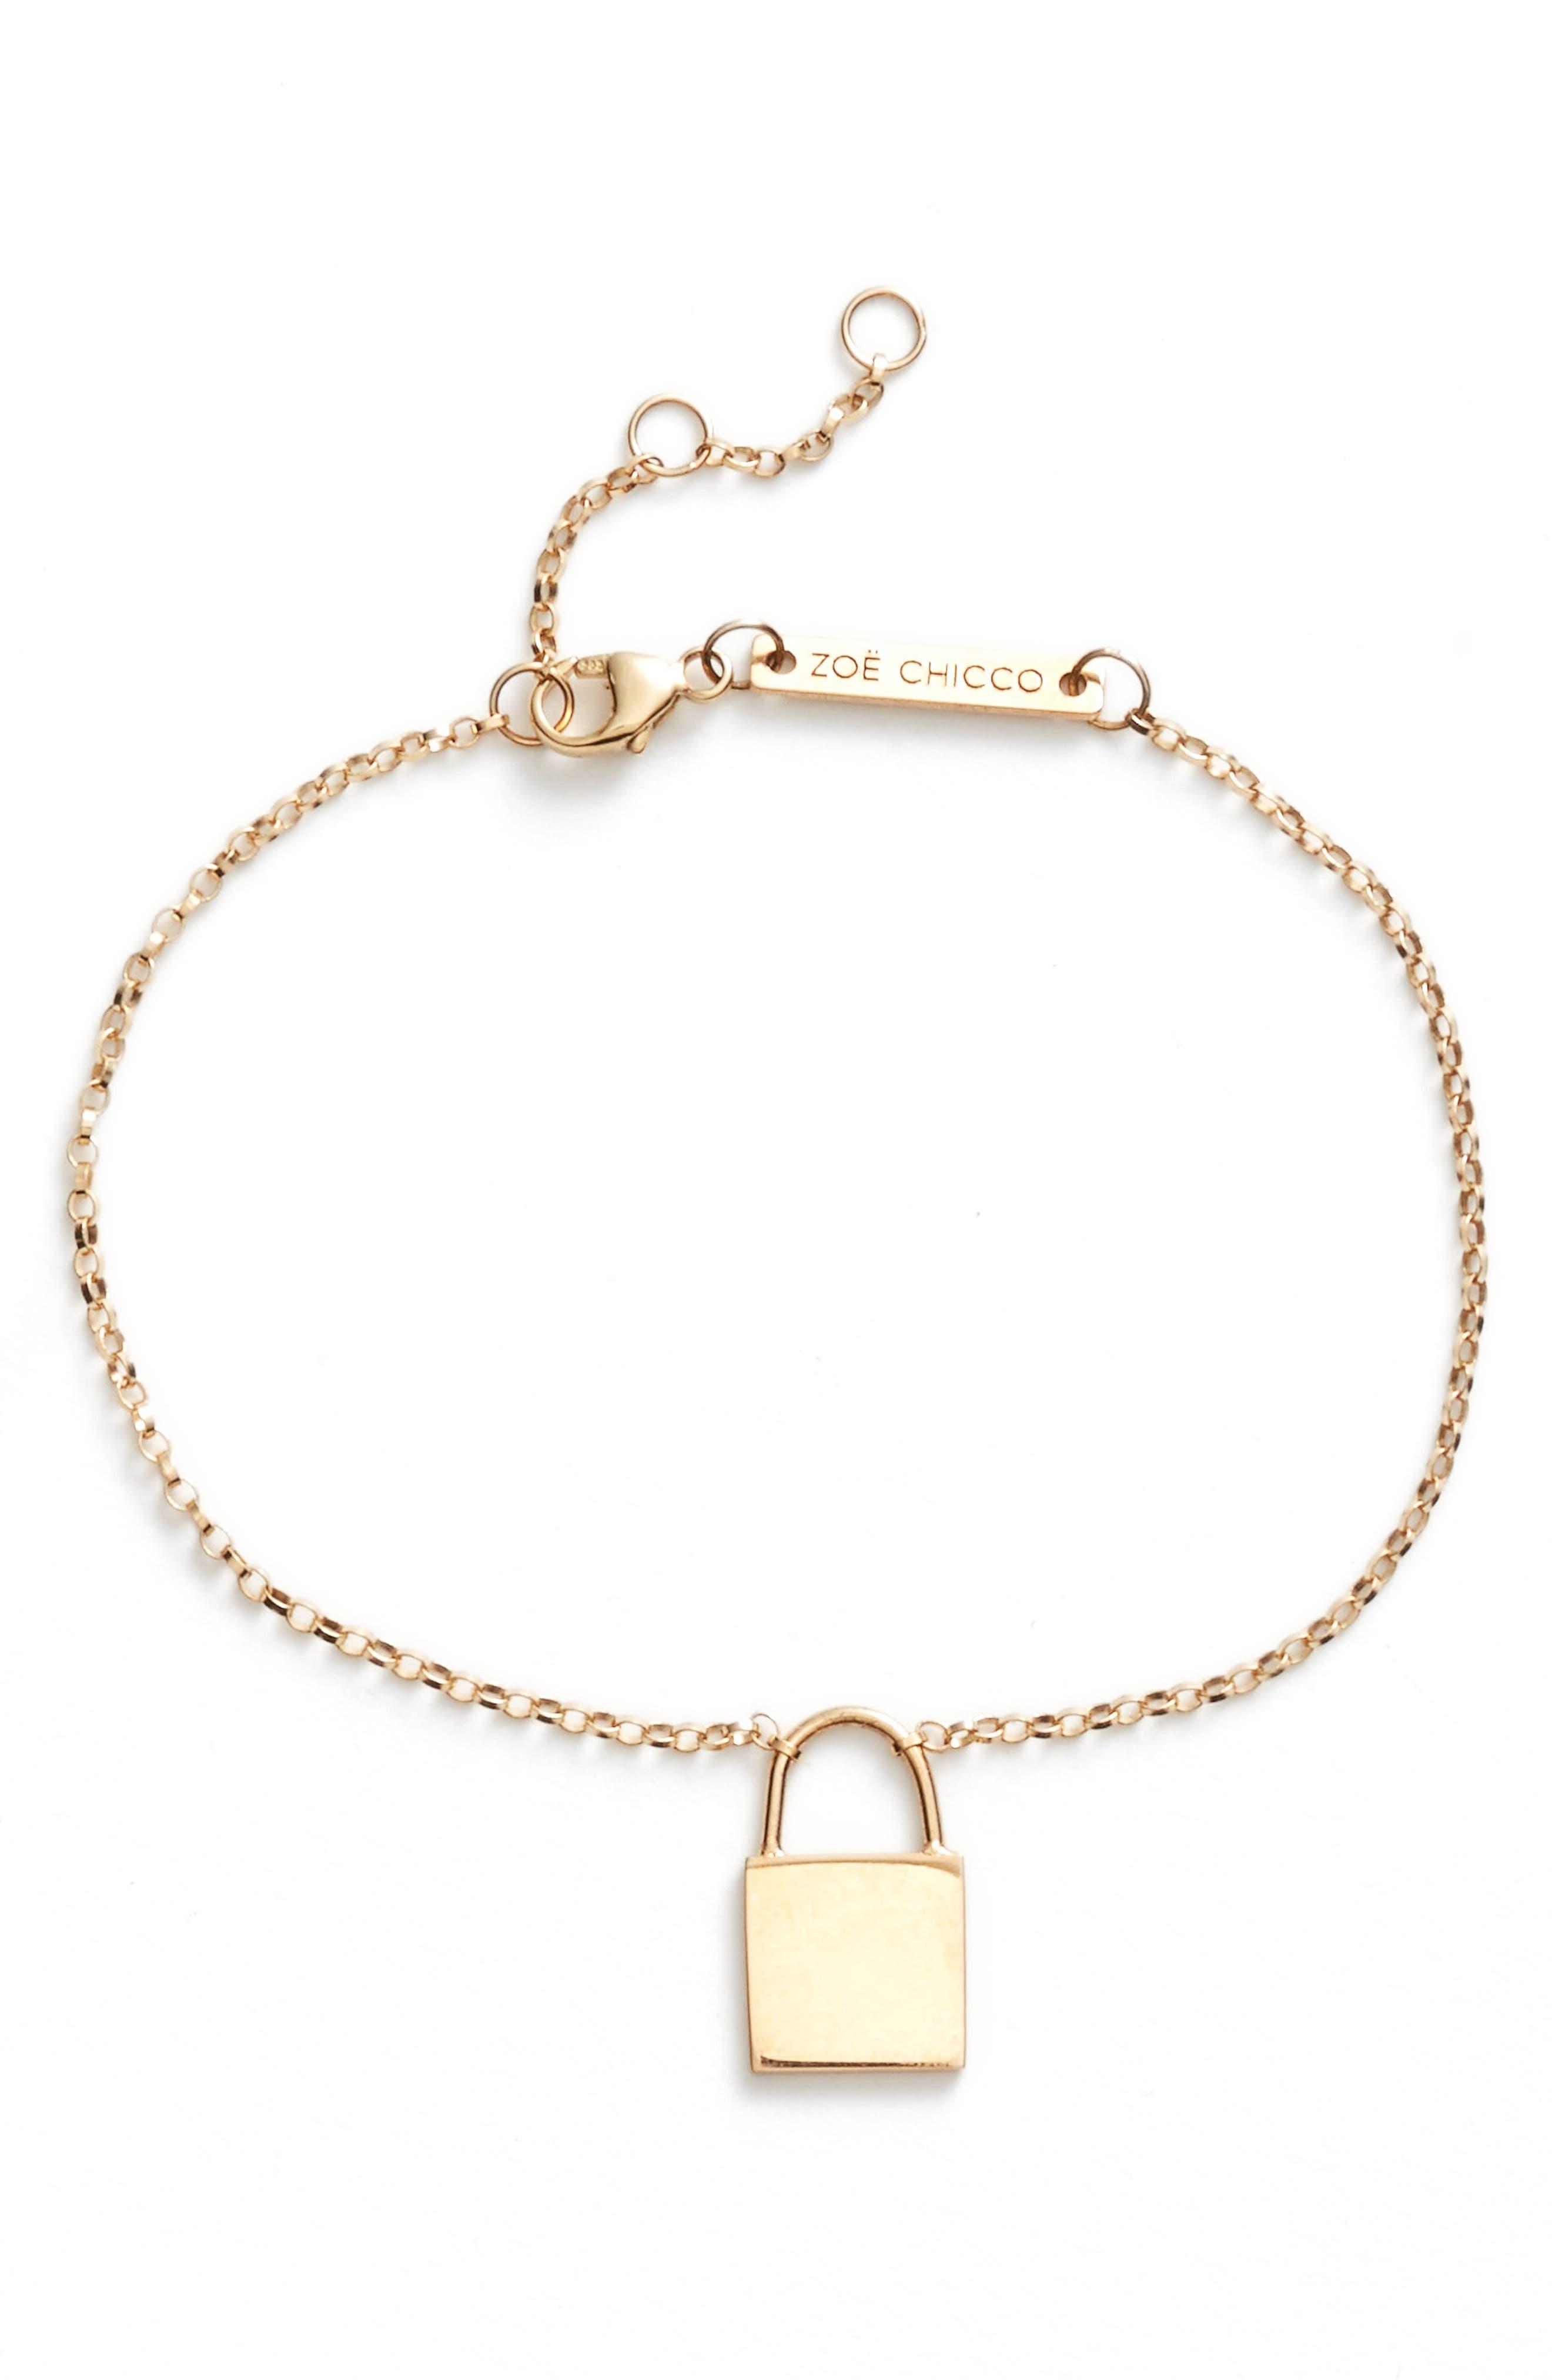 Zoe Chicco Small Padlock Bracelet